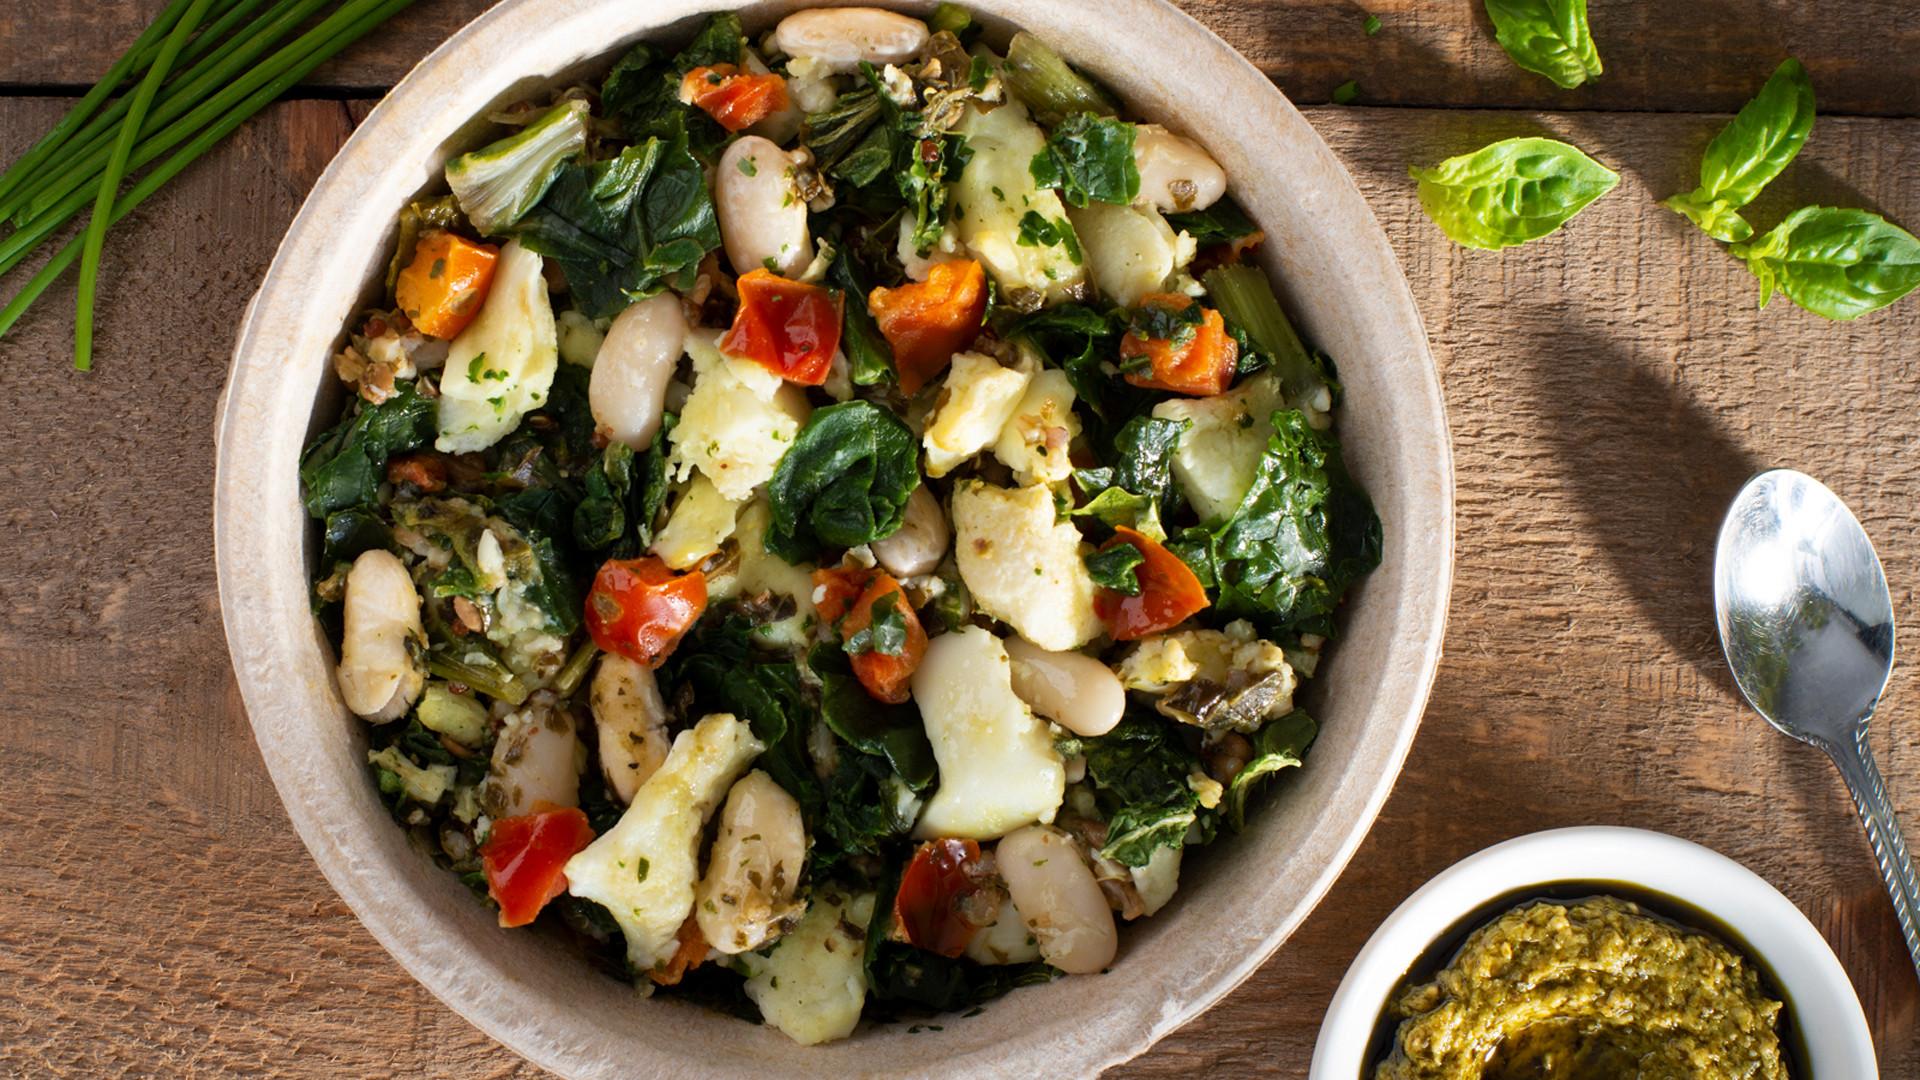 Healthy Choice Breakfast Power Bowls